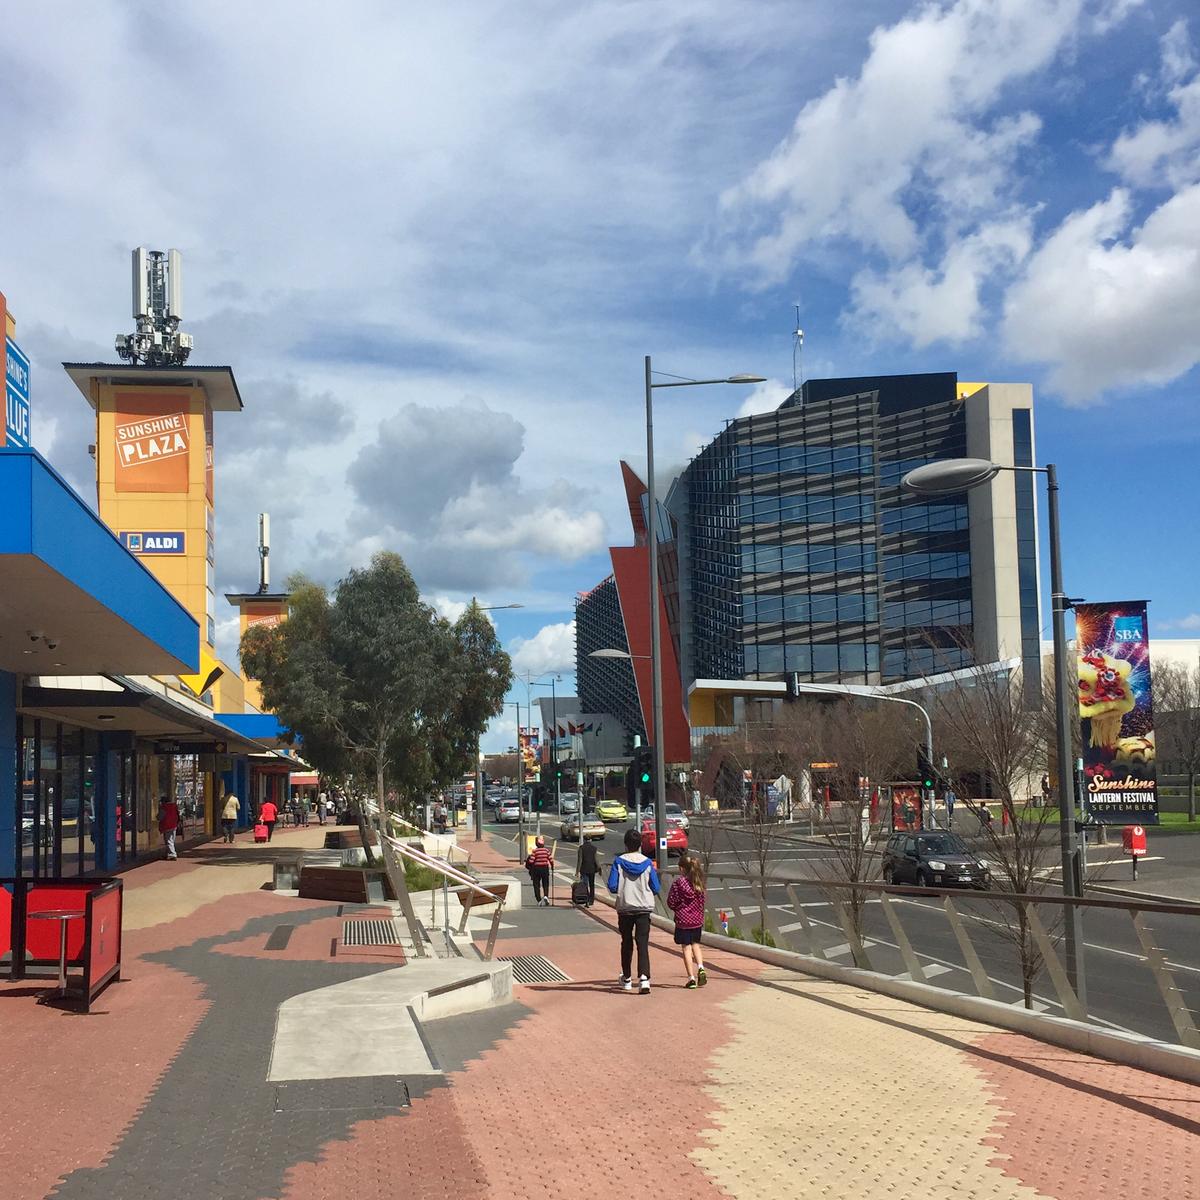 Citycenter: Sunshine, Victoria